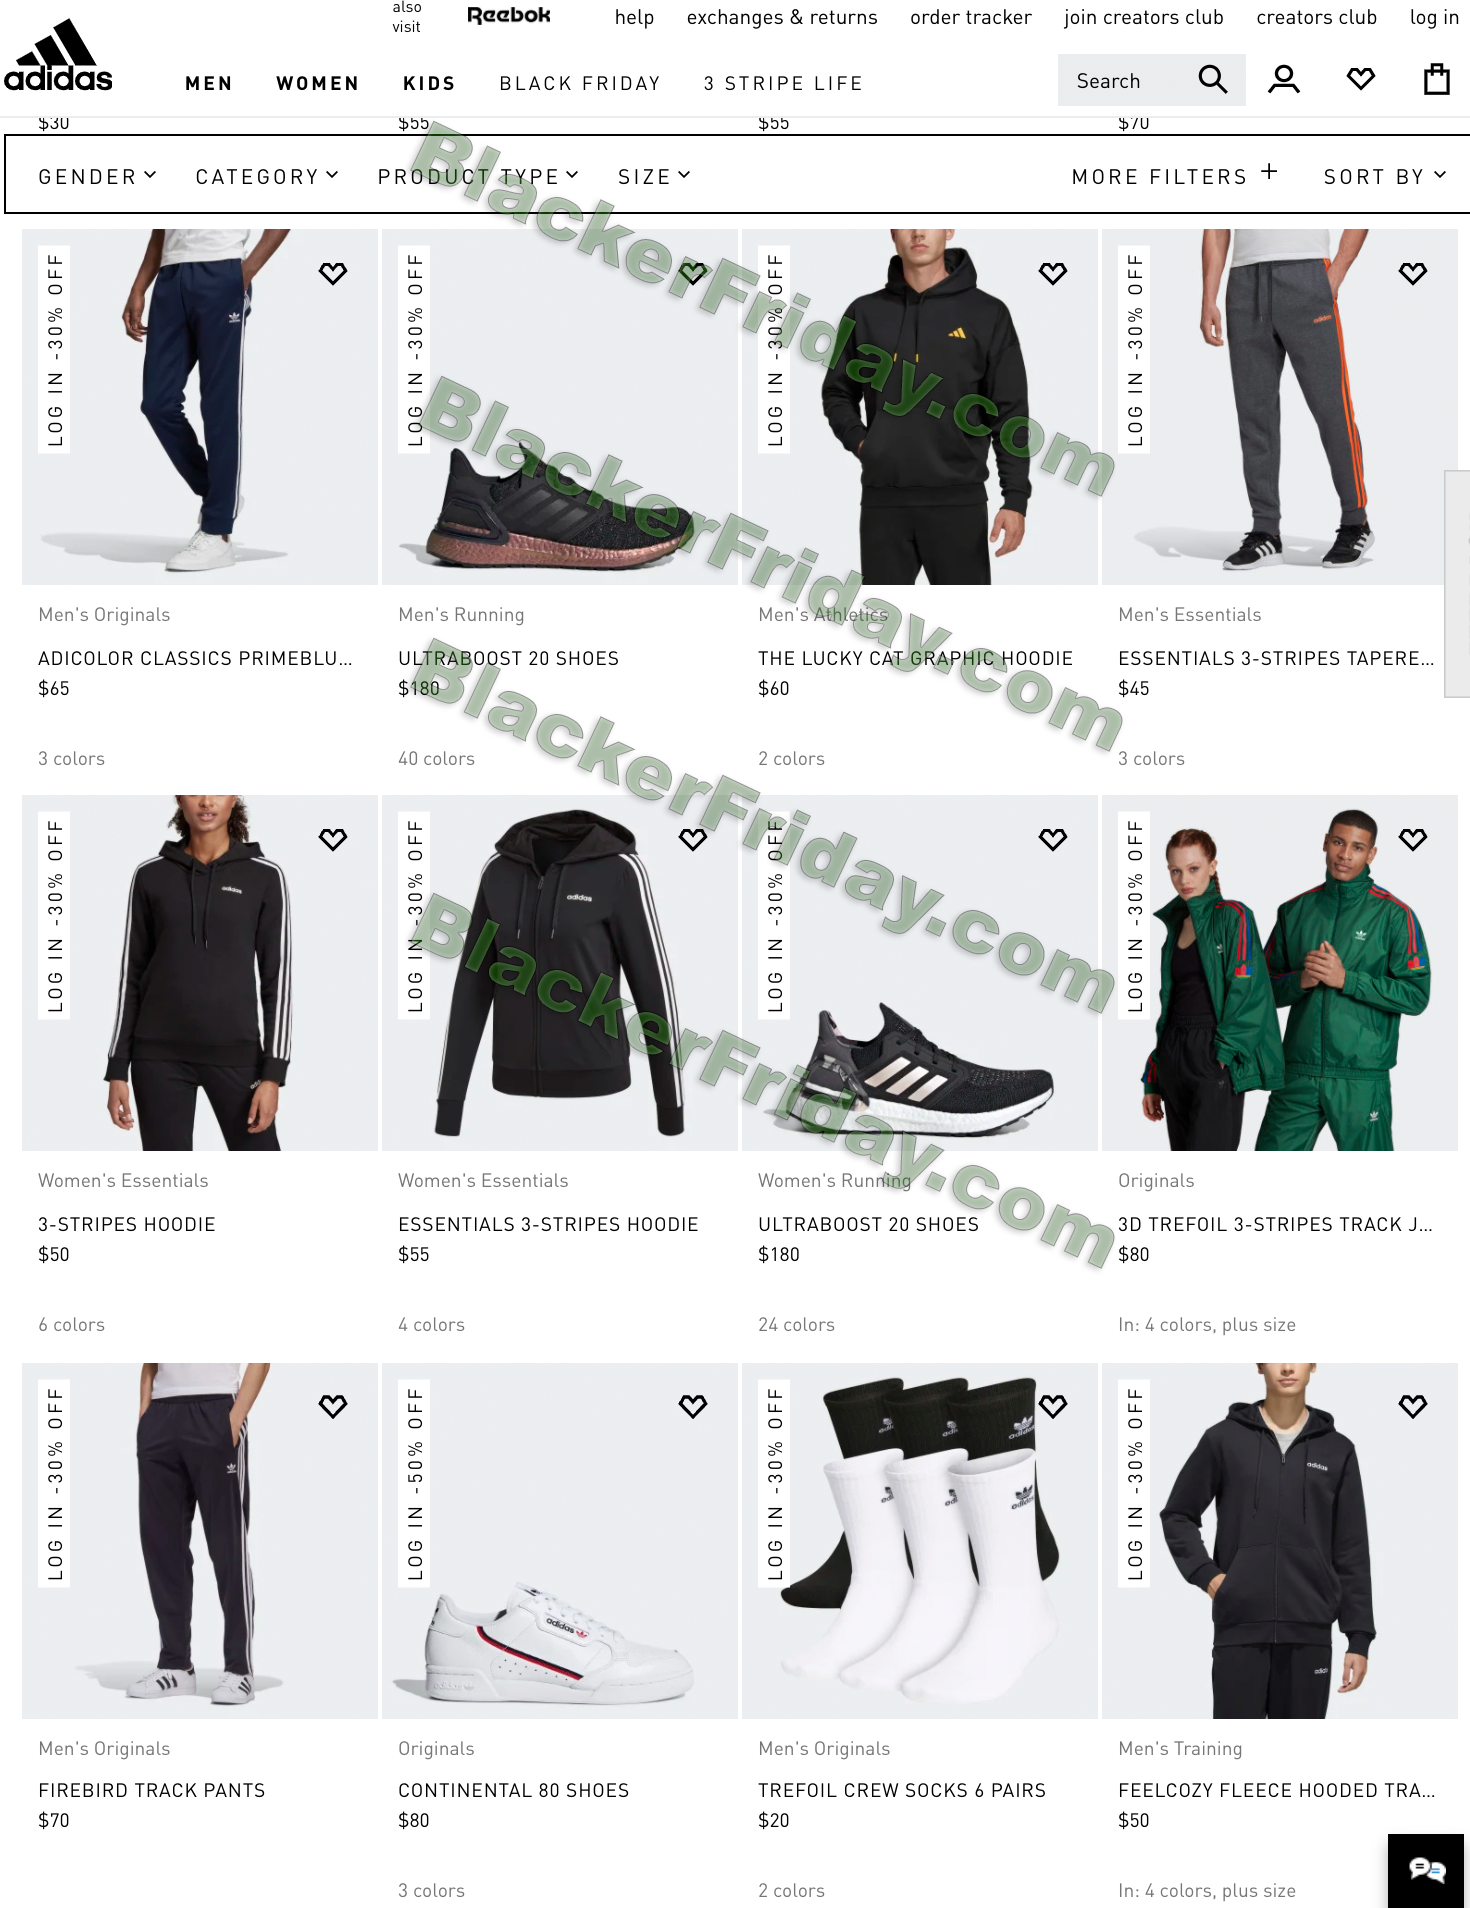 Ahorro Prestigioso Leche  Adidas Black Friday 2021 Sale - What to Expect - Blacker Friday